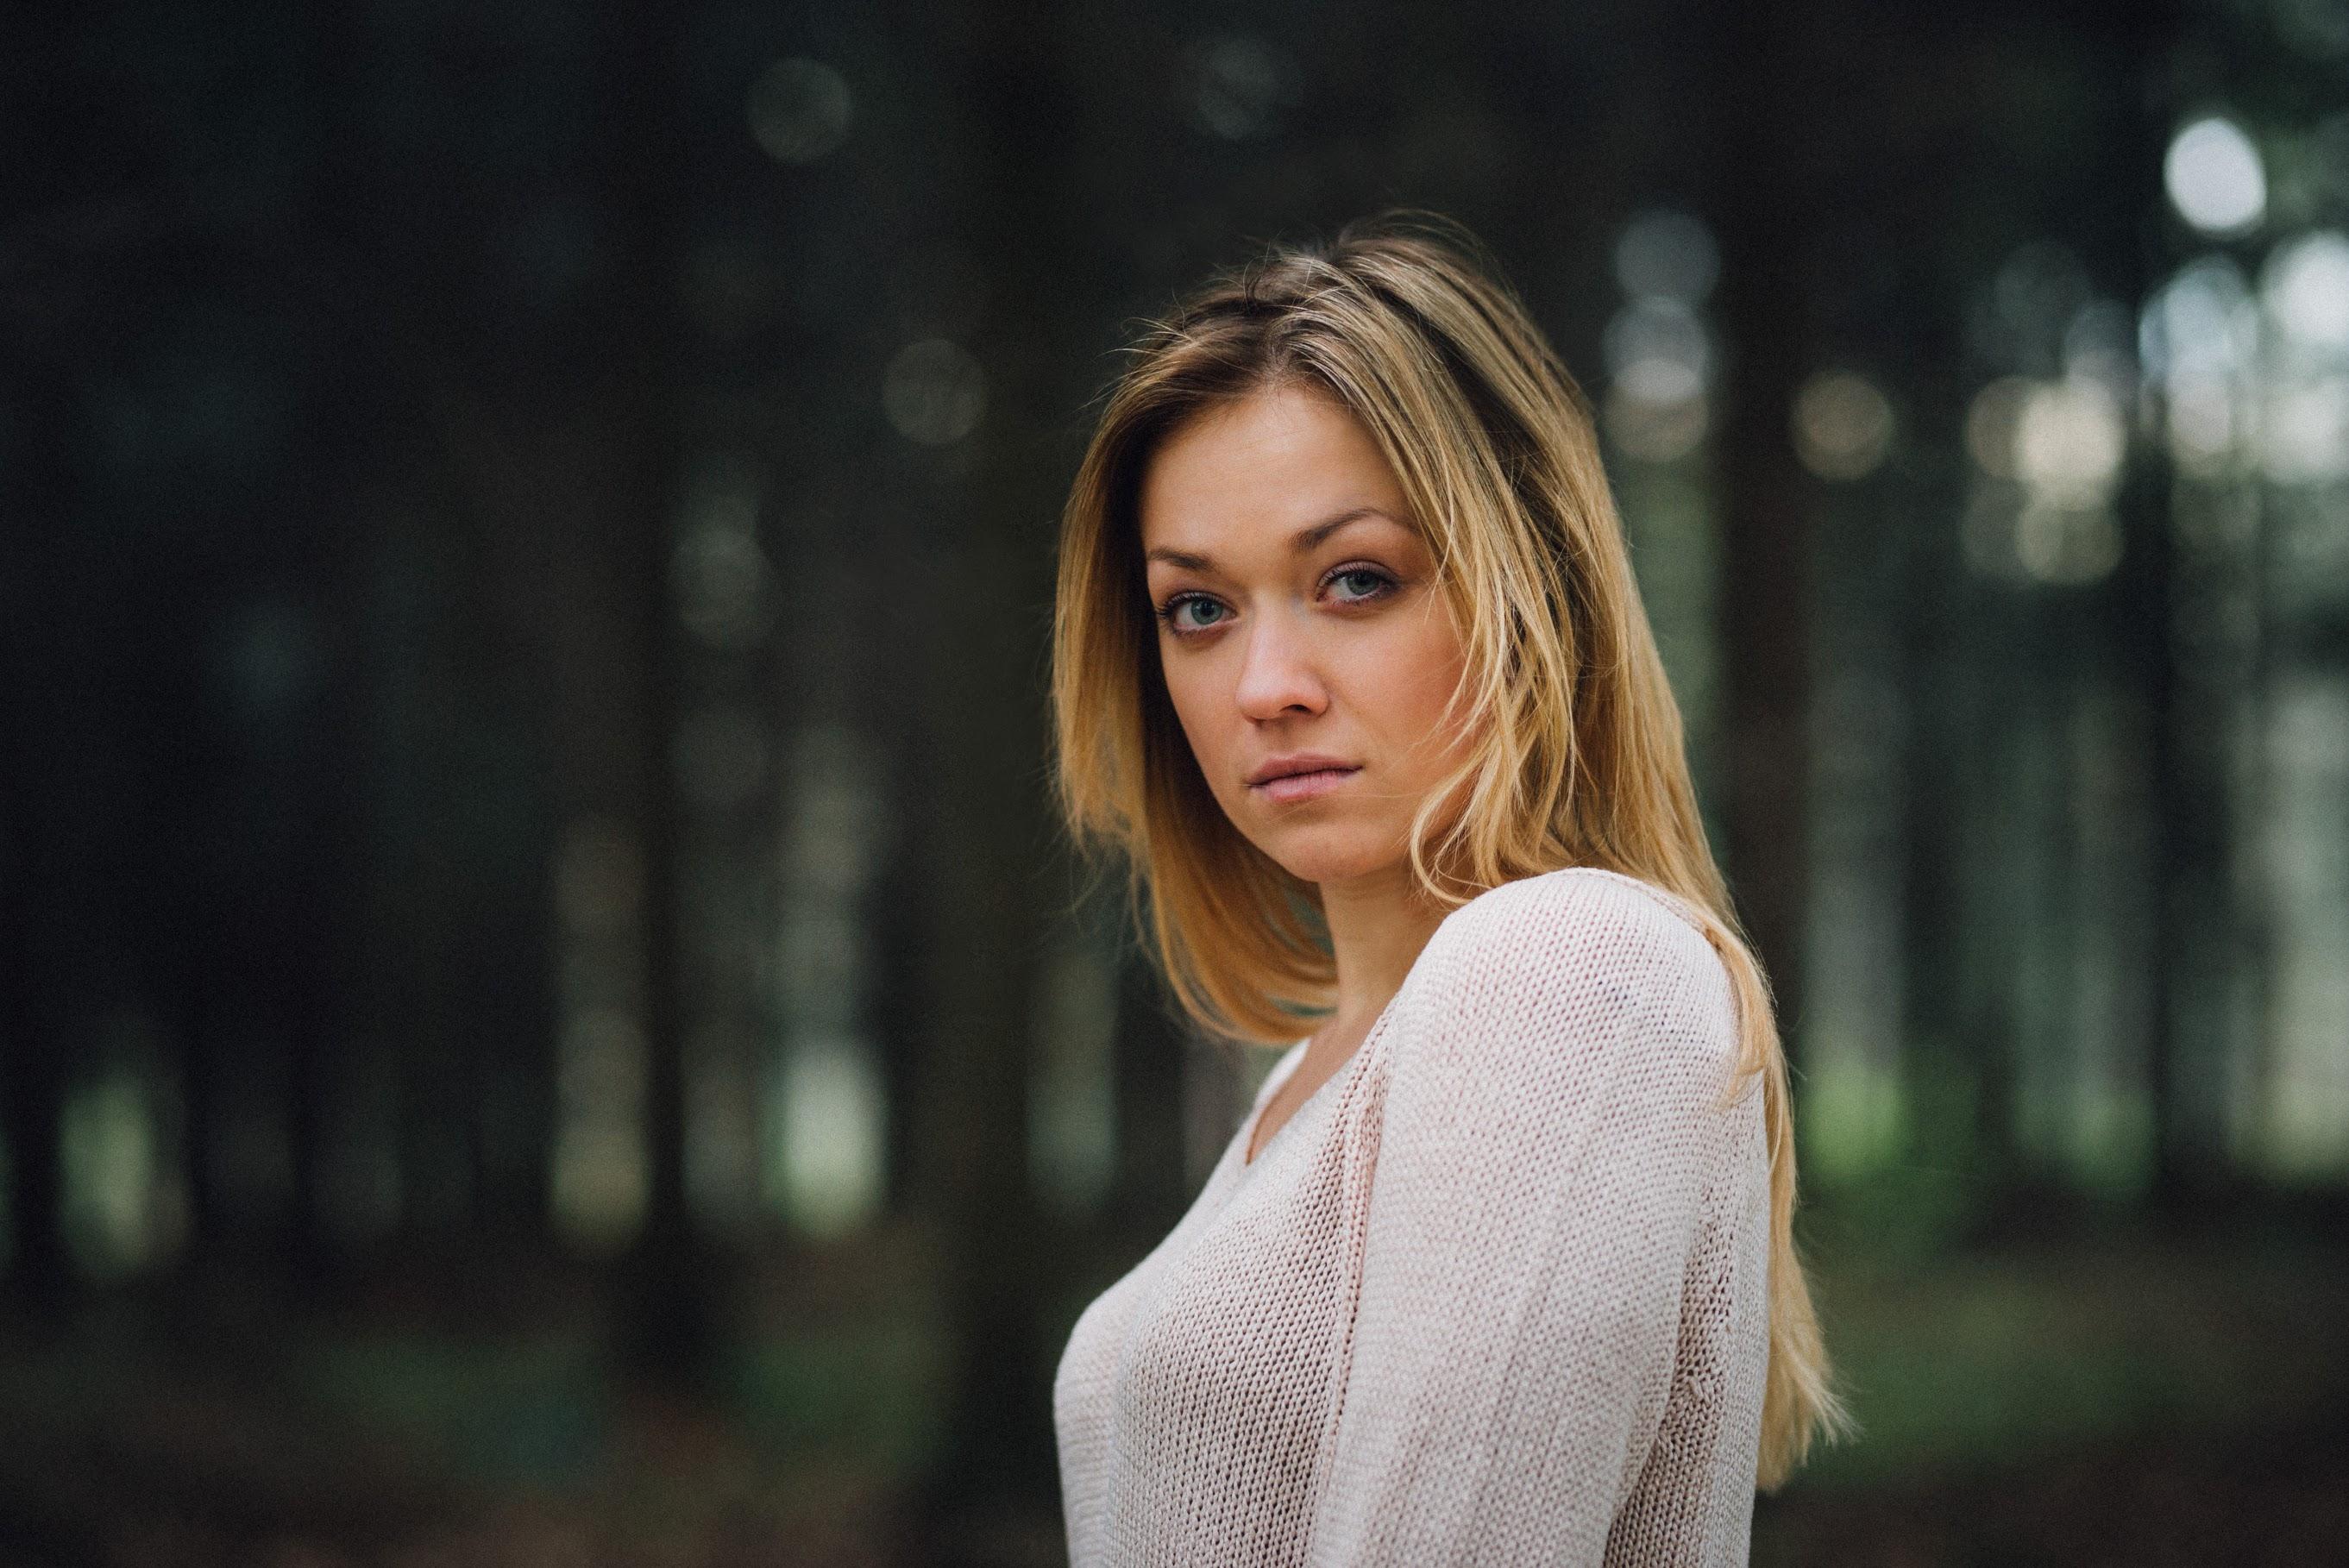 Maryla Morydz